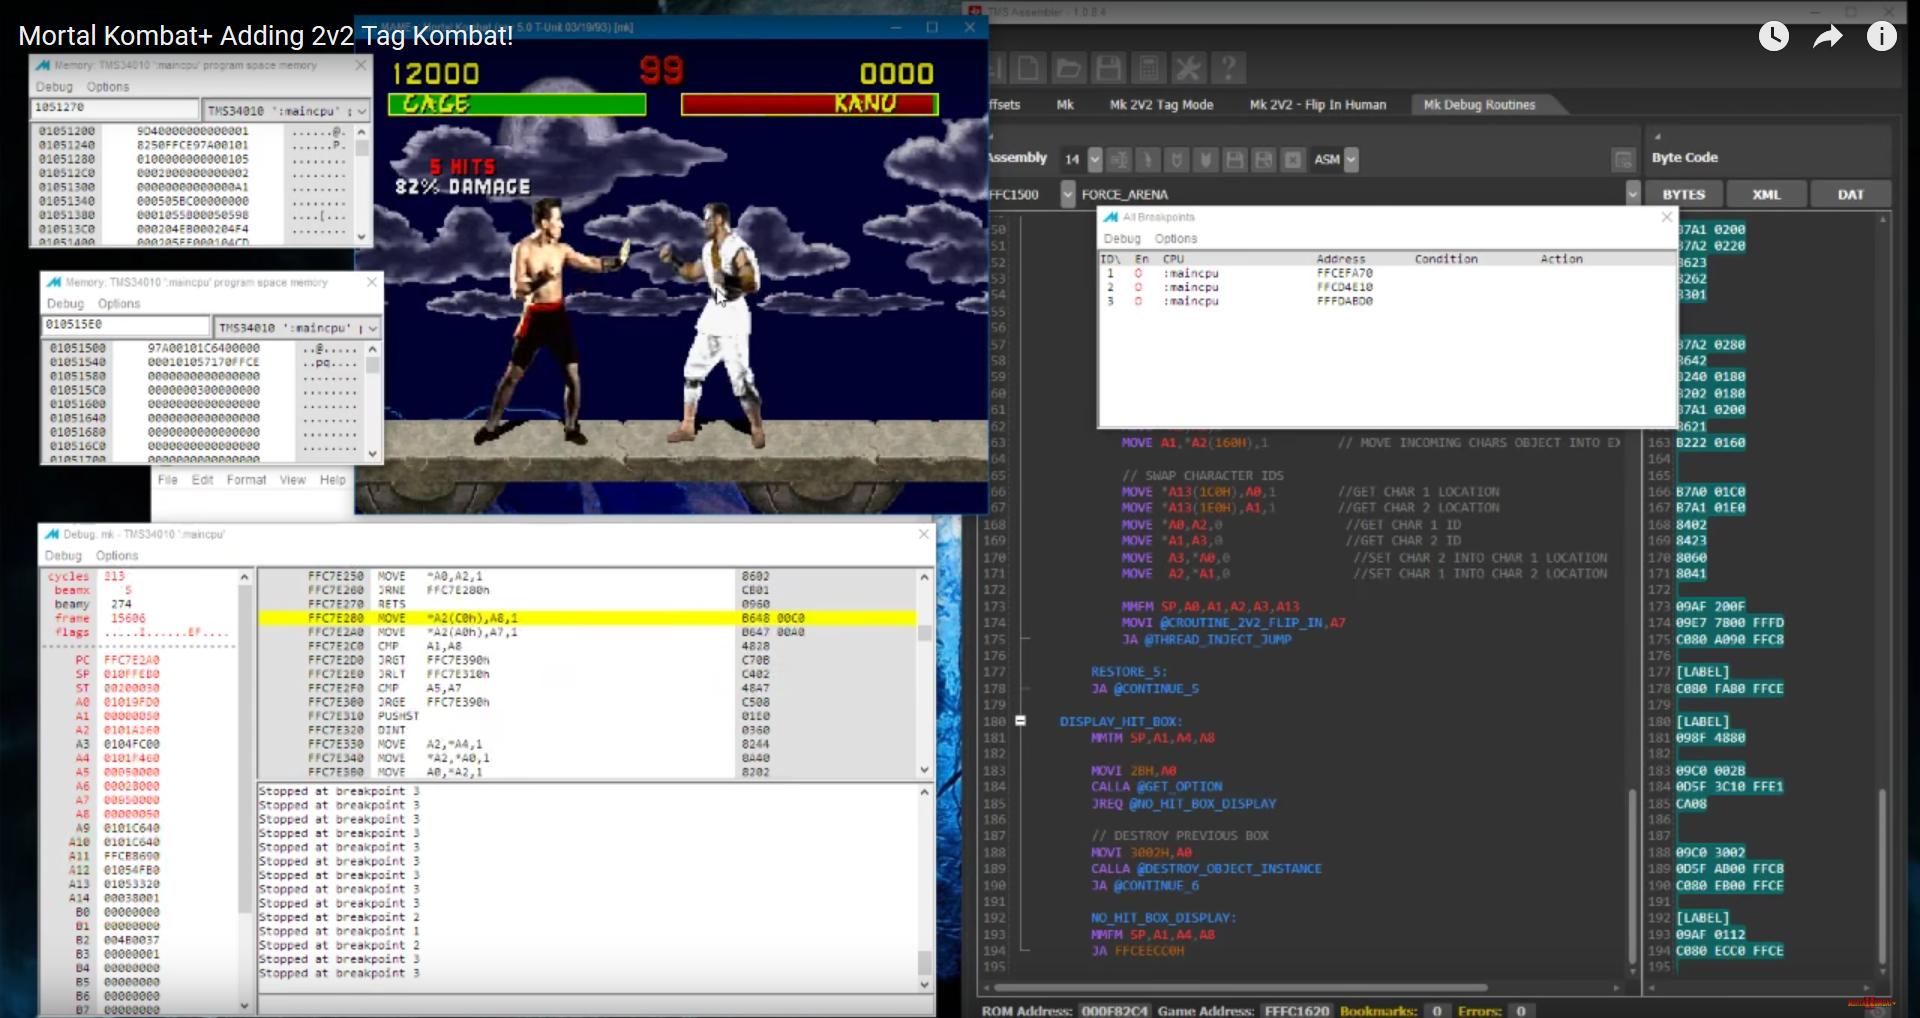 Mortal Kombat Arcade 4-Player Tag Mode